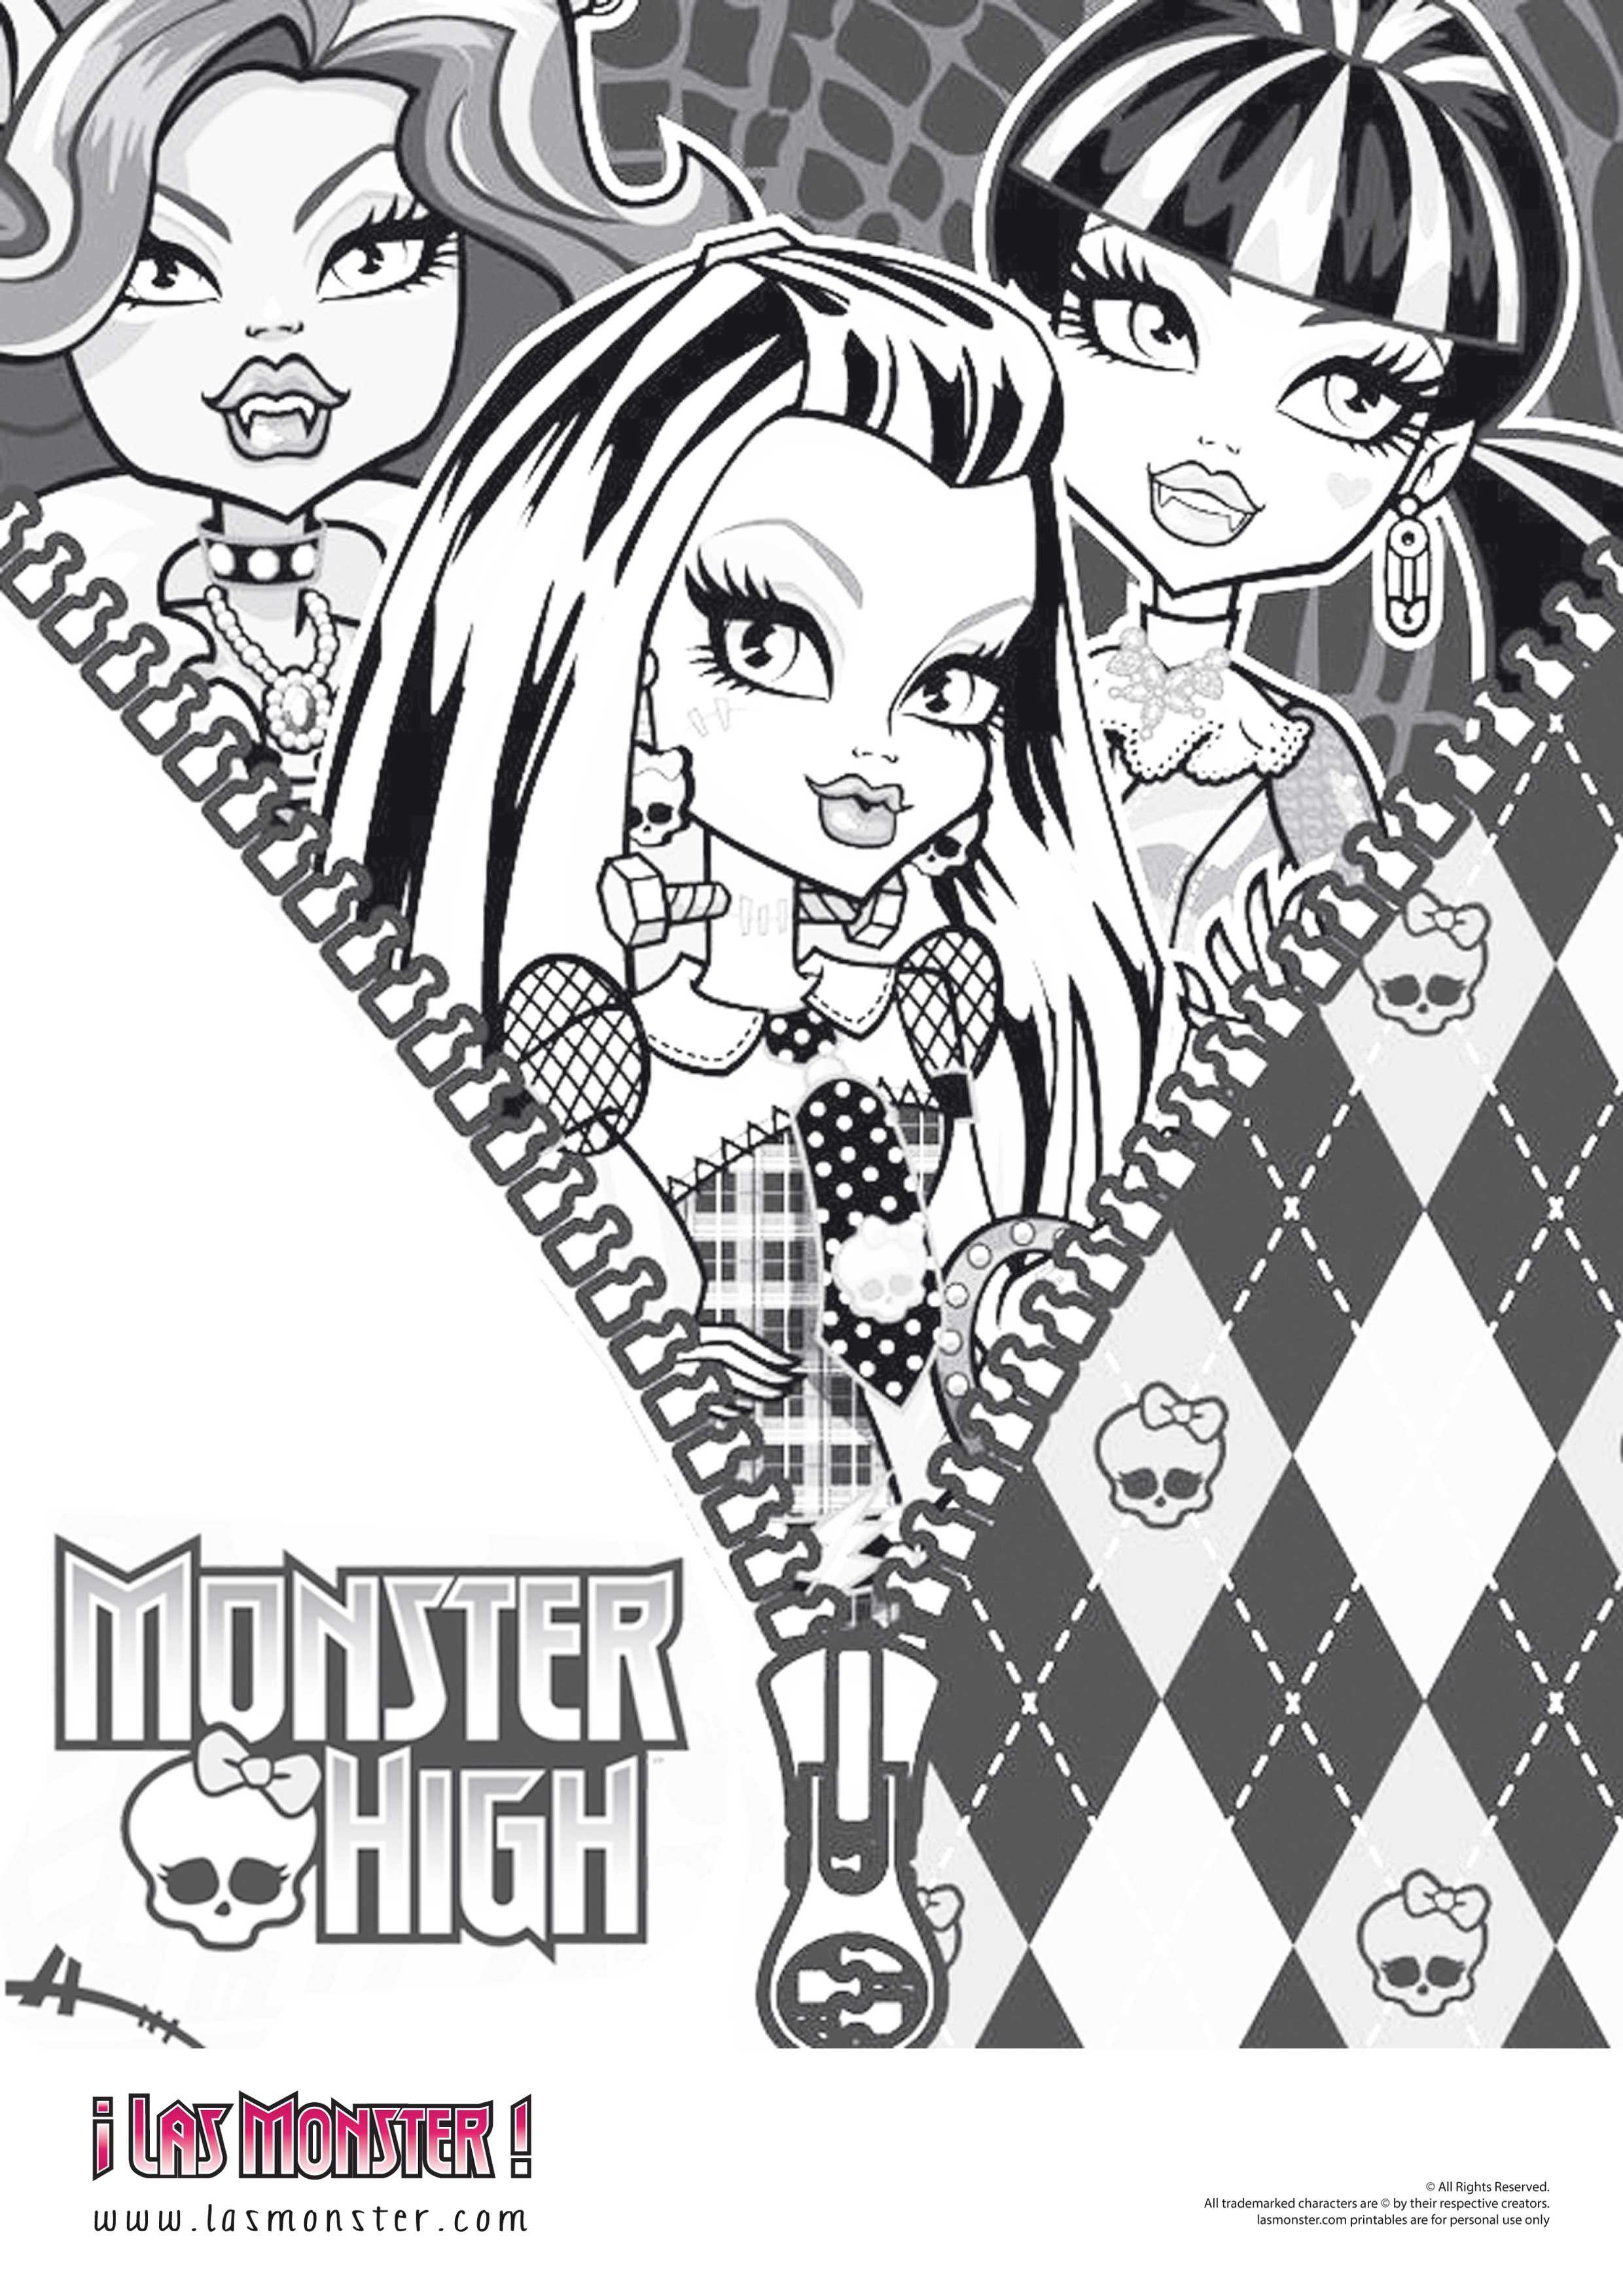 dibujo-chicas-monster-high | diseño | Pinterest | Monster high ...